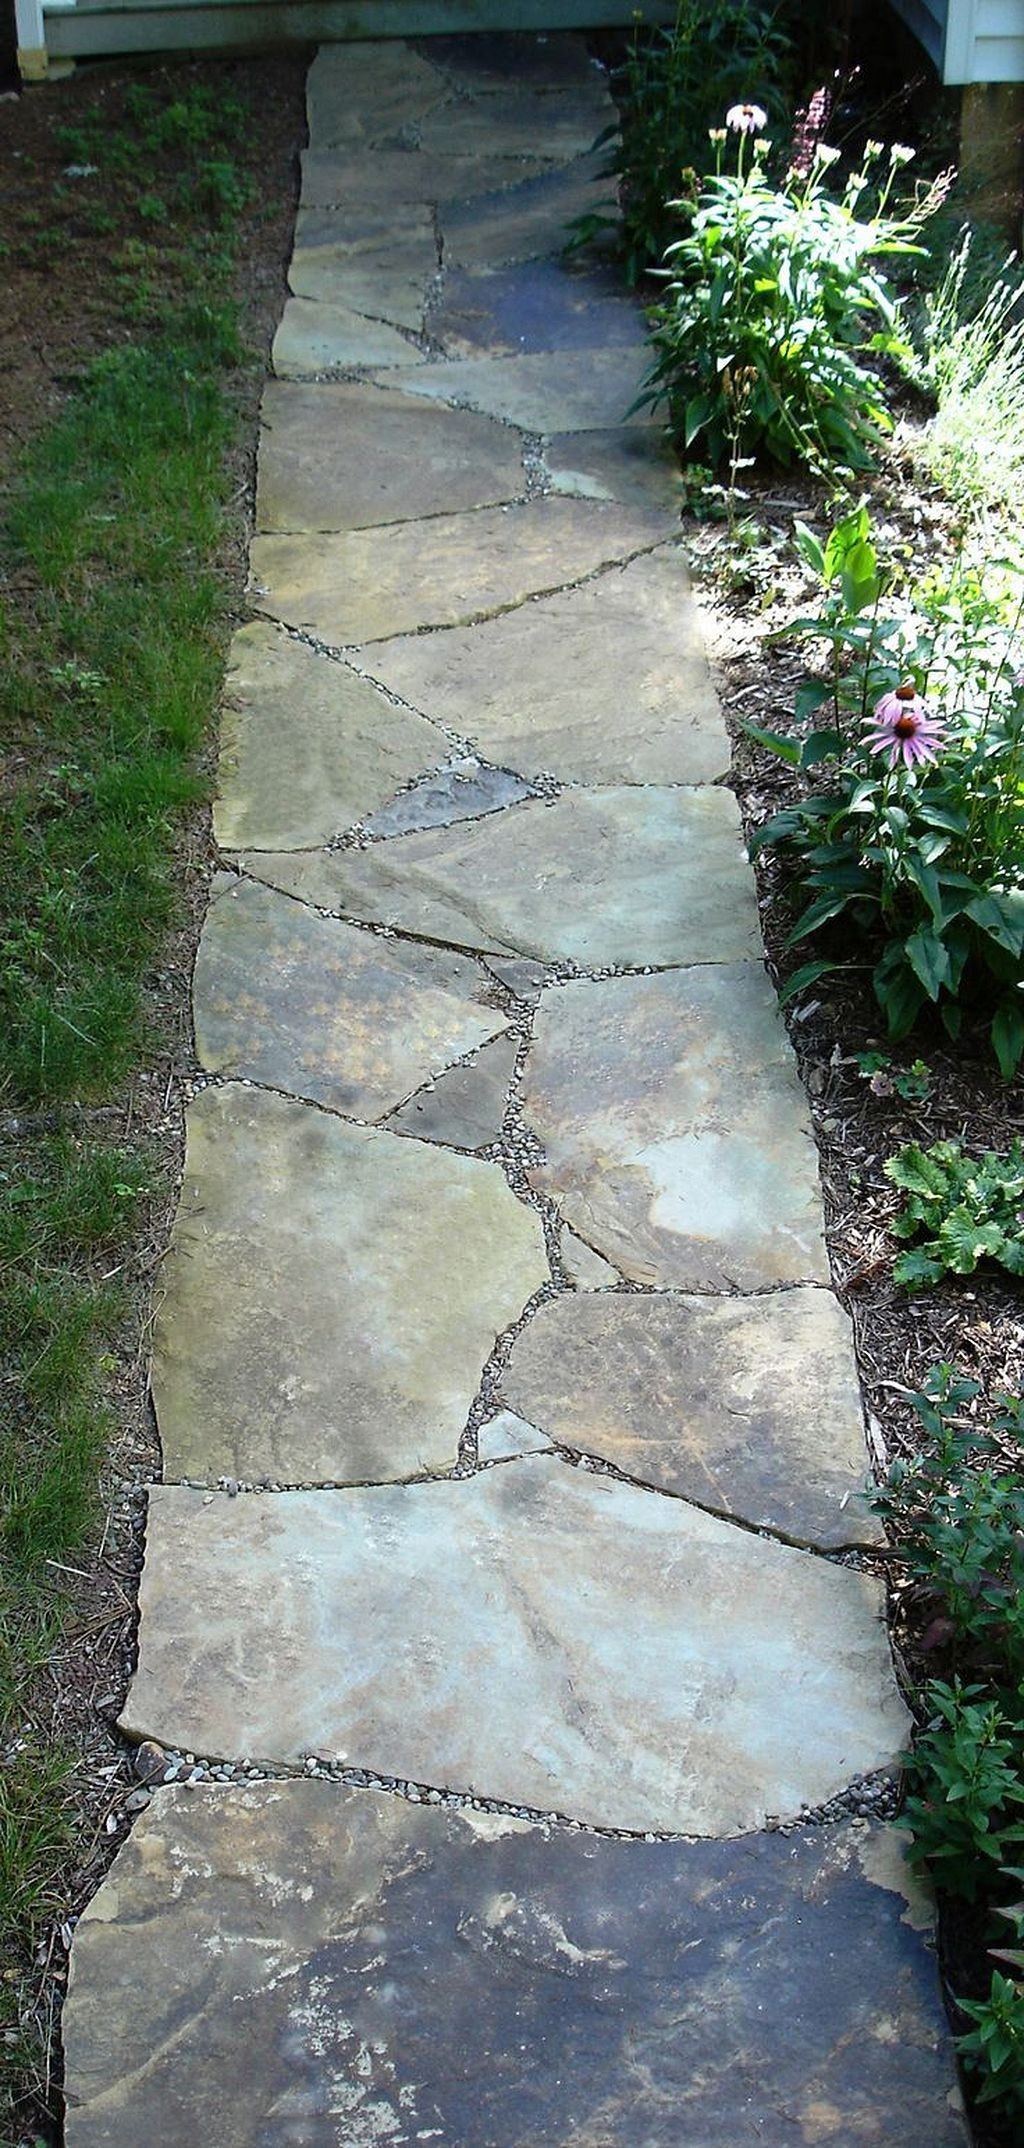 200 Rocks And Stones Walkway Design Ideas | Stone walkway, Walkways ...